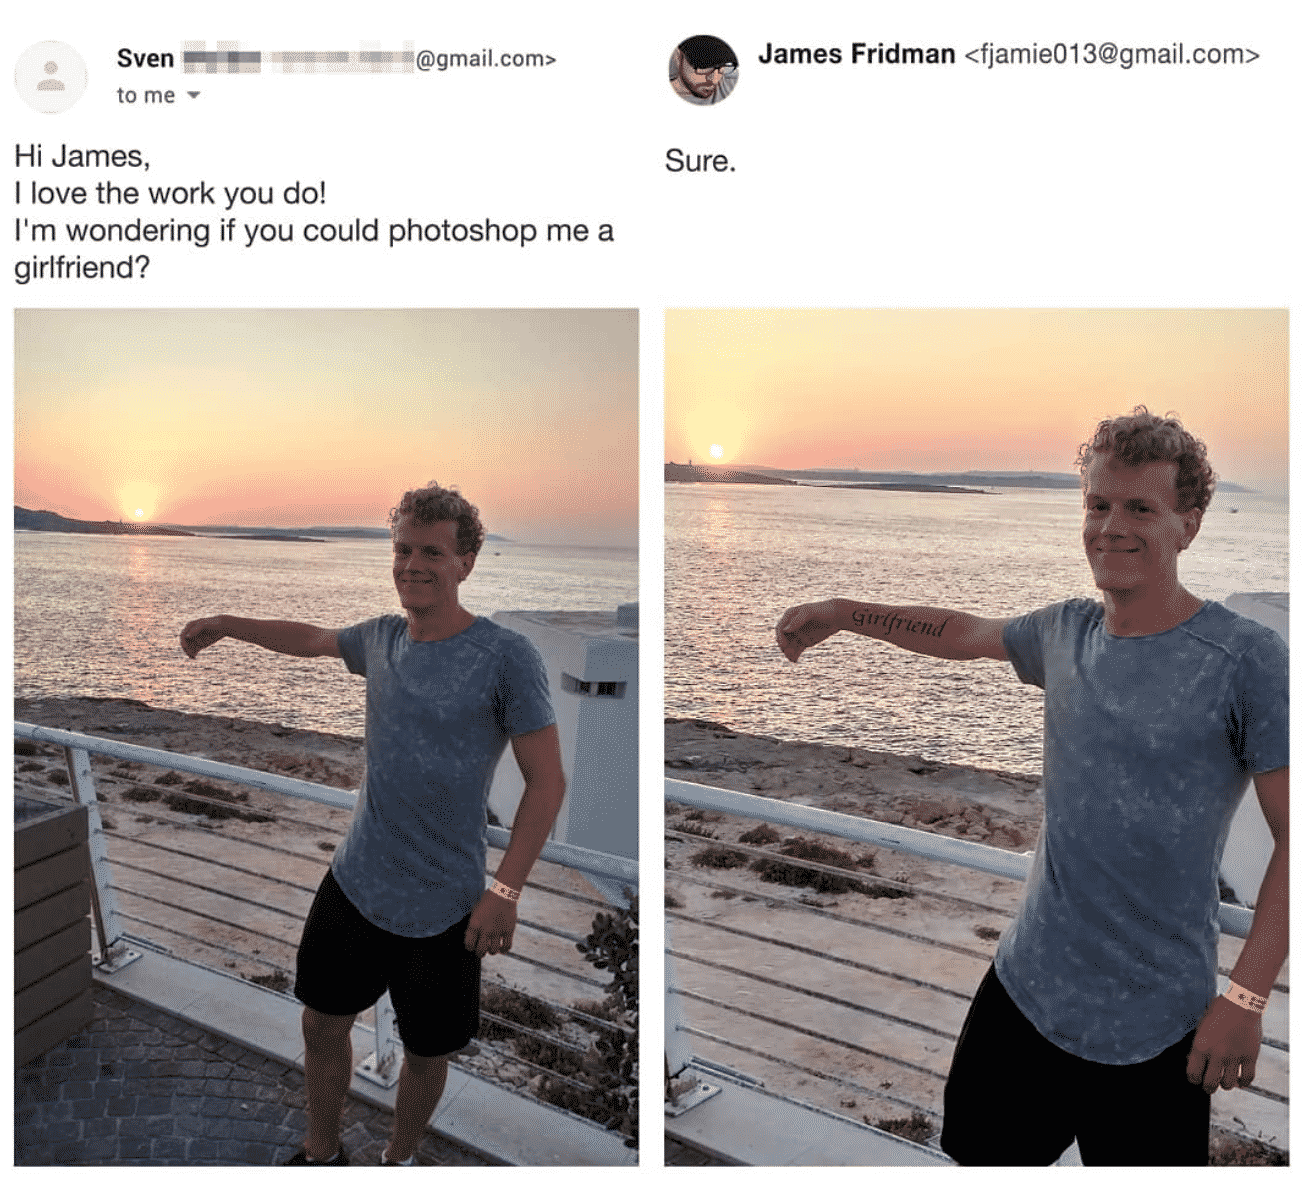 photoshop pranks, photoshop troll, james fridman, photoshop troll james fridman